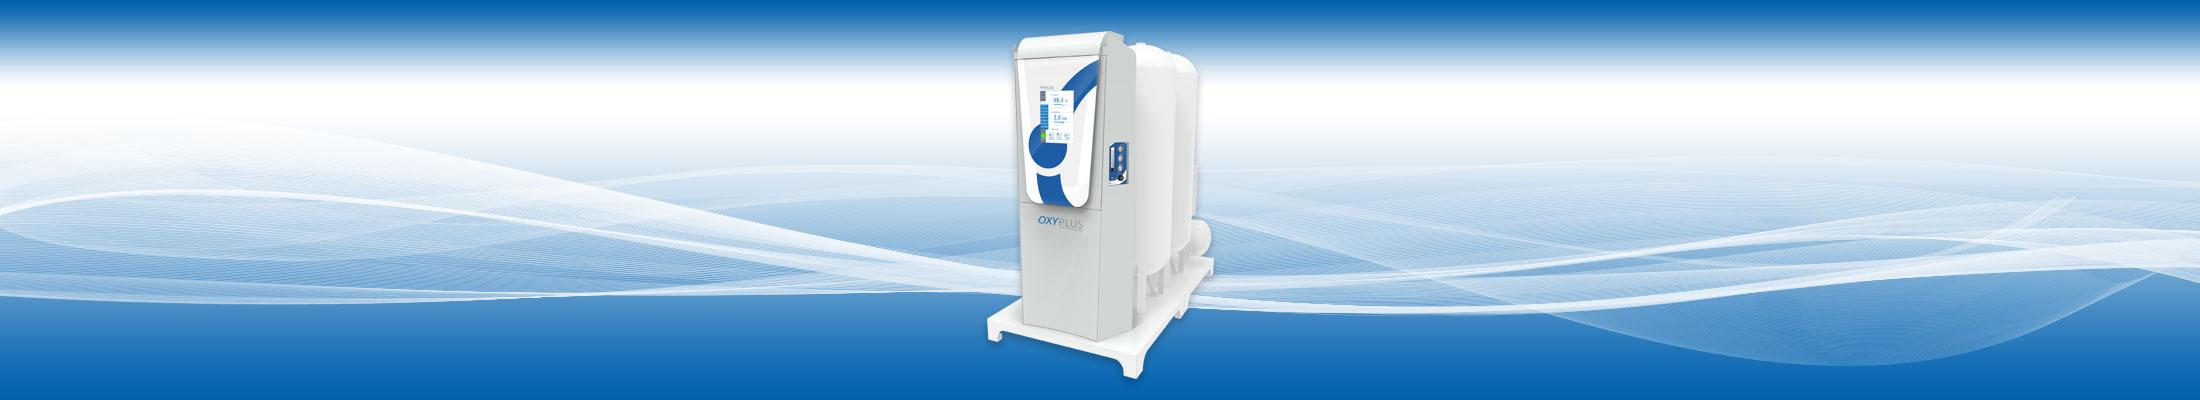 99,5% - Ultra High Purity DS-PSA Oxygen Generator